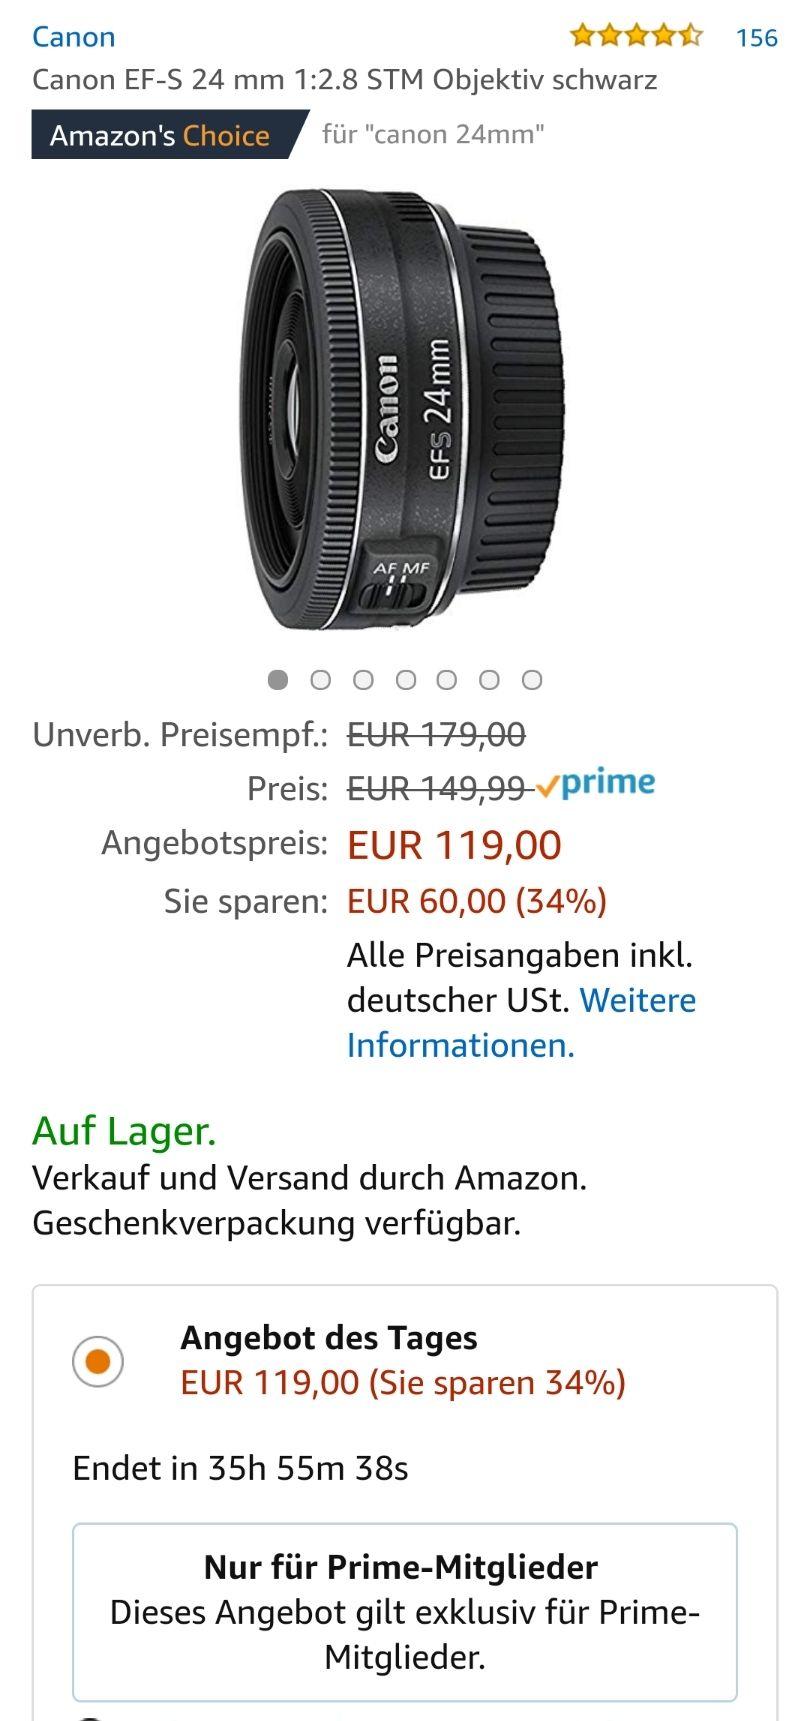 Canon EF-S 24 mm 1:2,8 STM